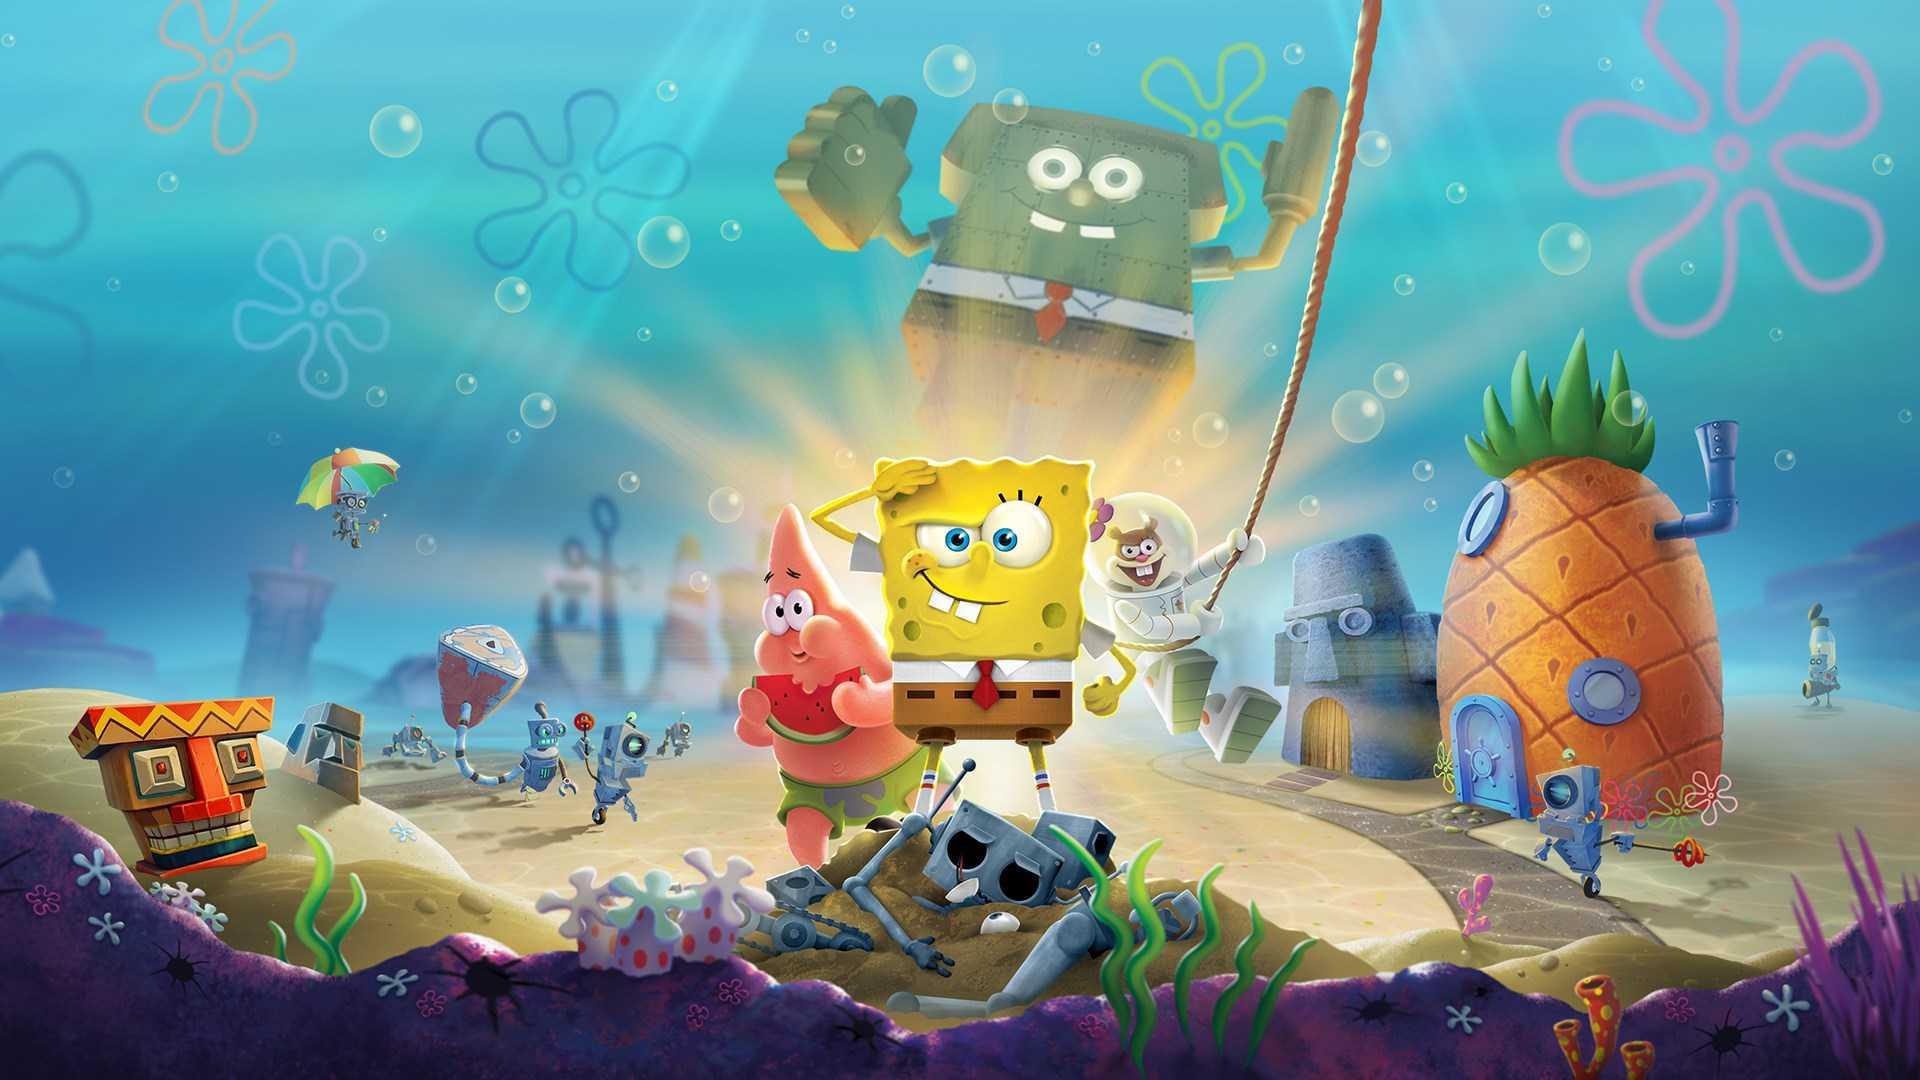 Новый трейлер SpongeBob SquarePants: Battle for Bikini Bottom